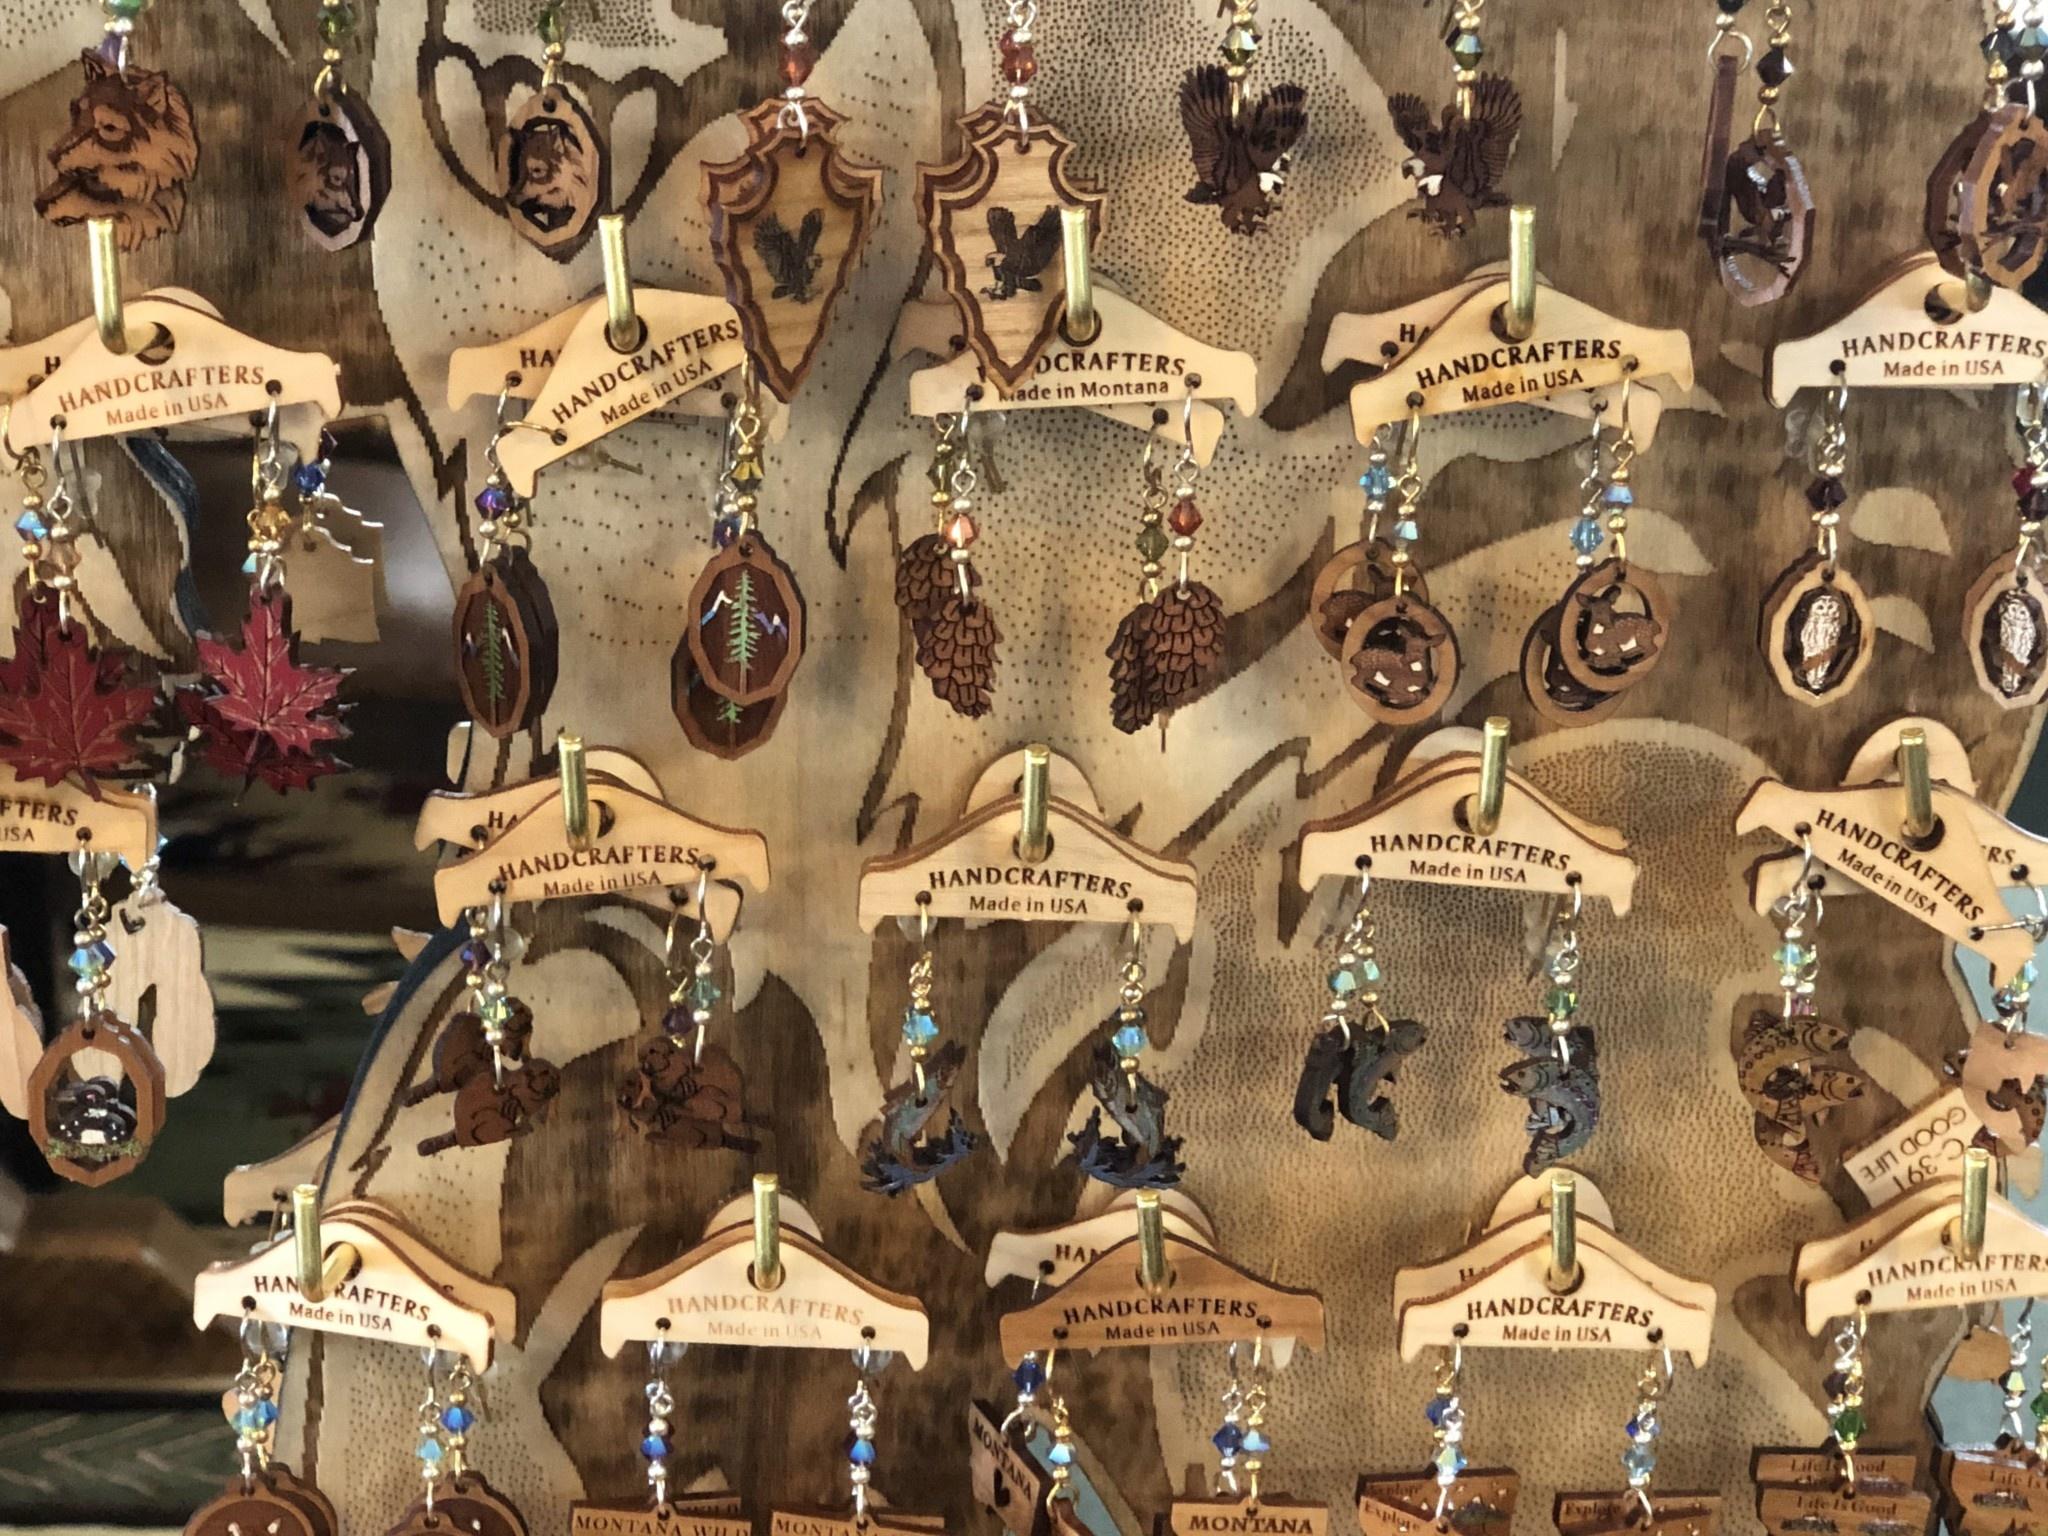 Handcrafters Gifts Wooden Earrings